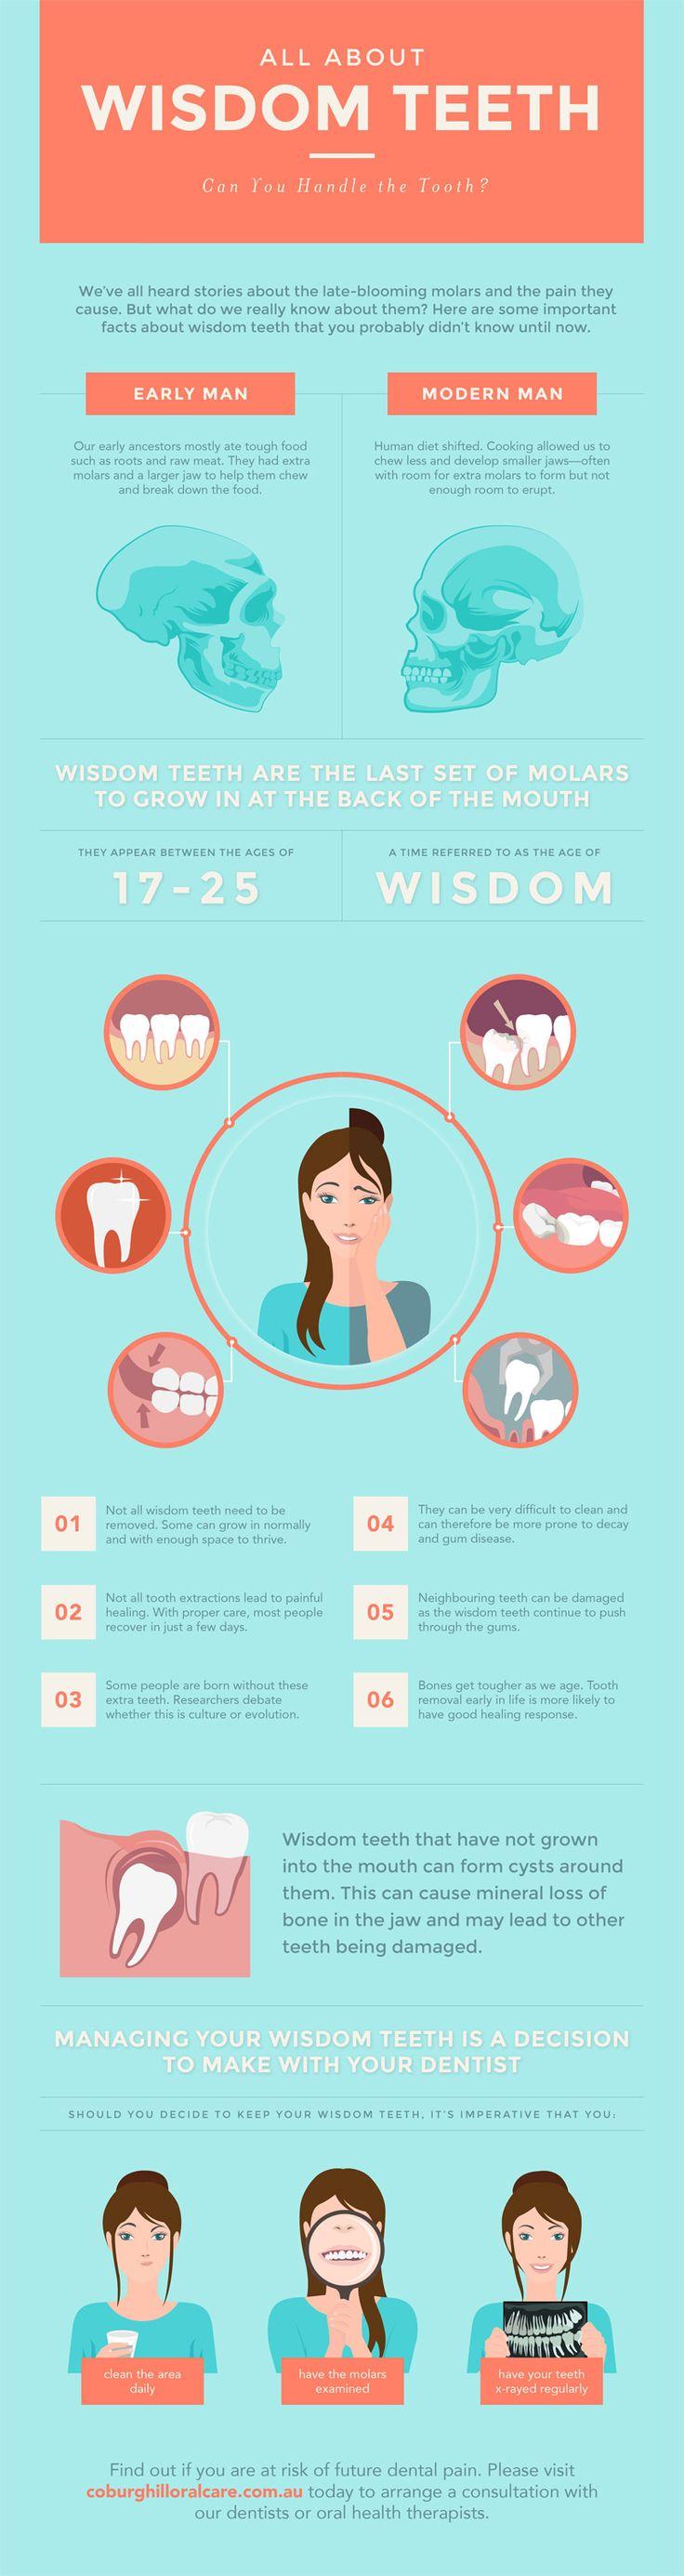 Infographic amazing wisdom teeth facts wisdom teeth